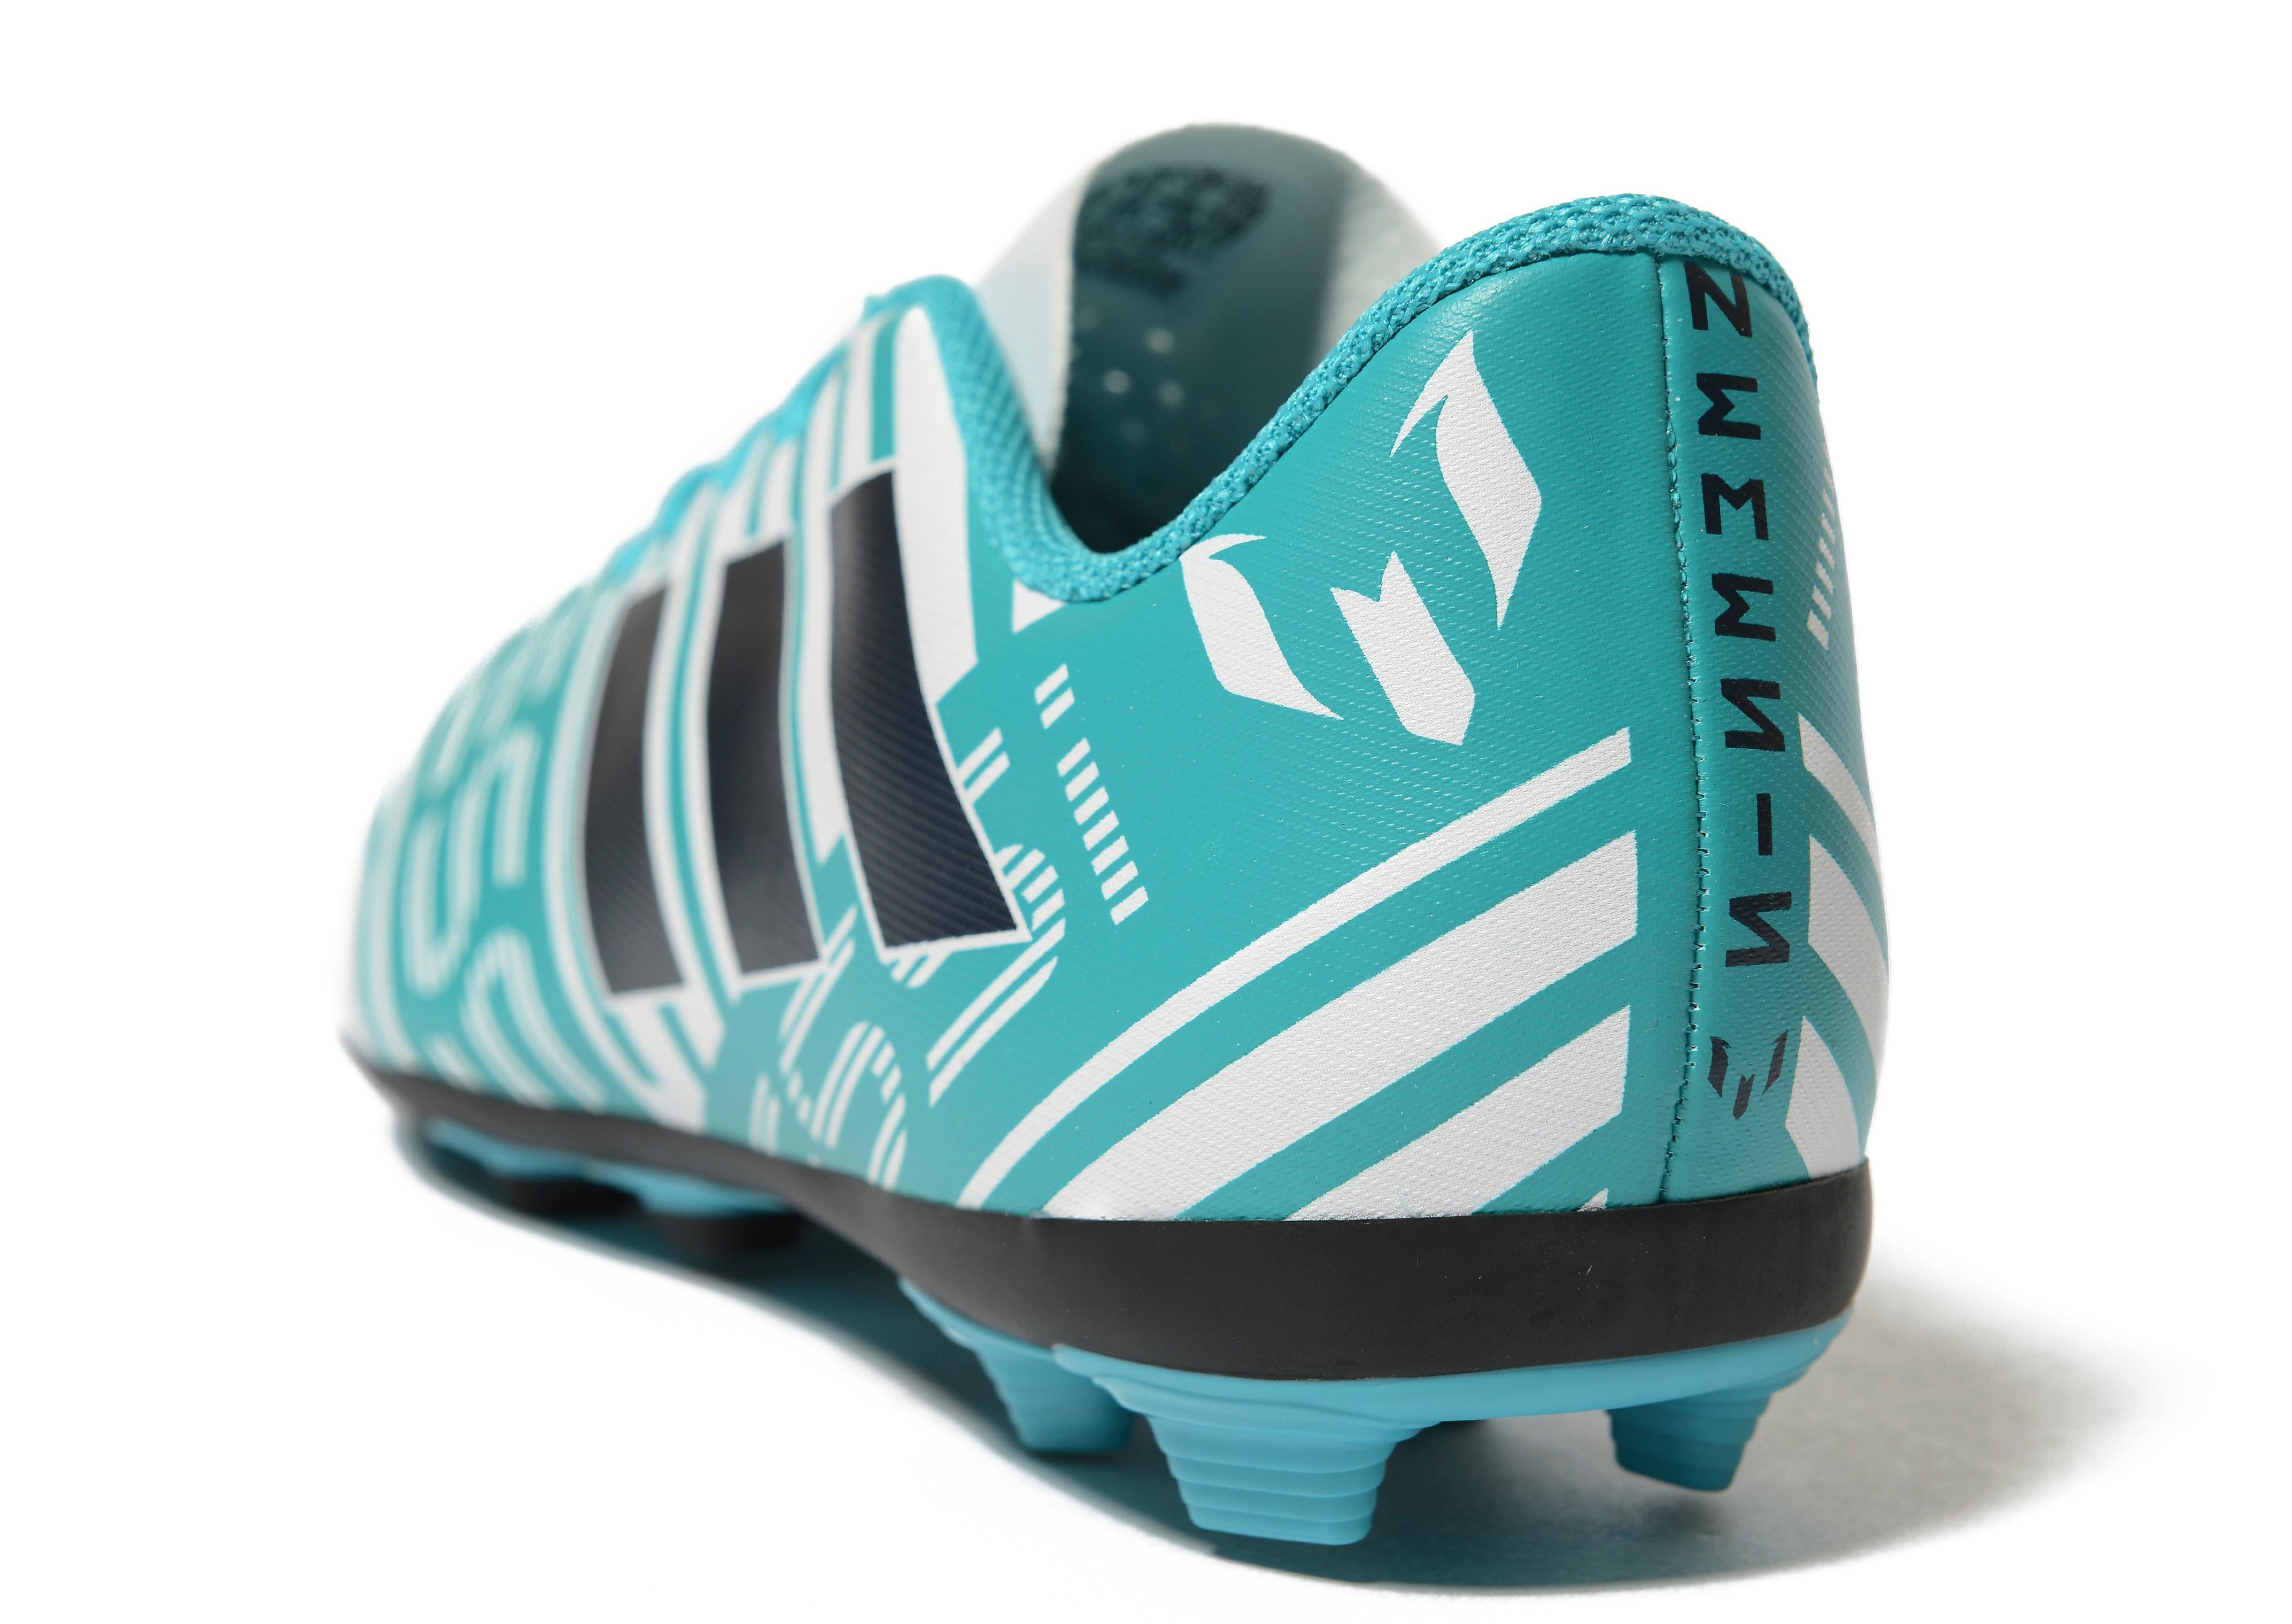 adidas Ocean Storm Nemeziz 17.4 FG Messi Children